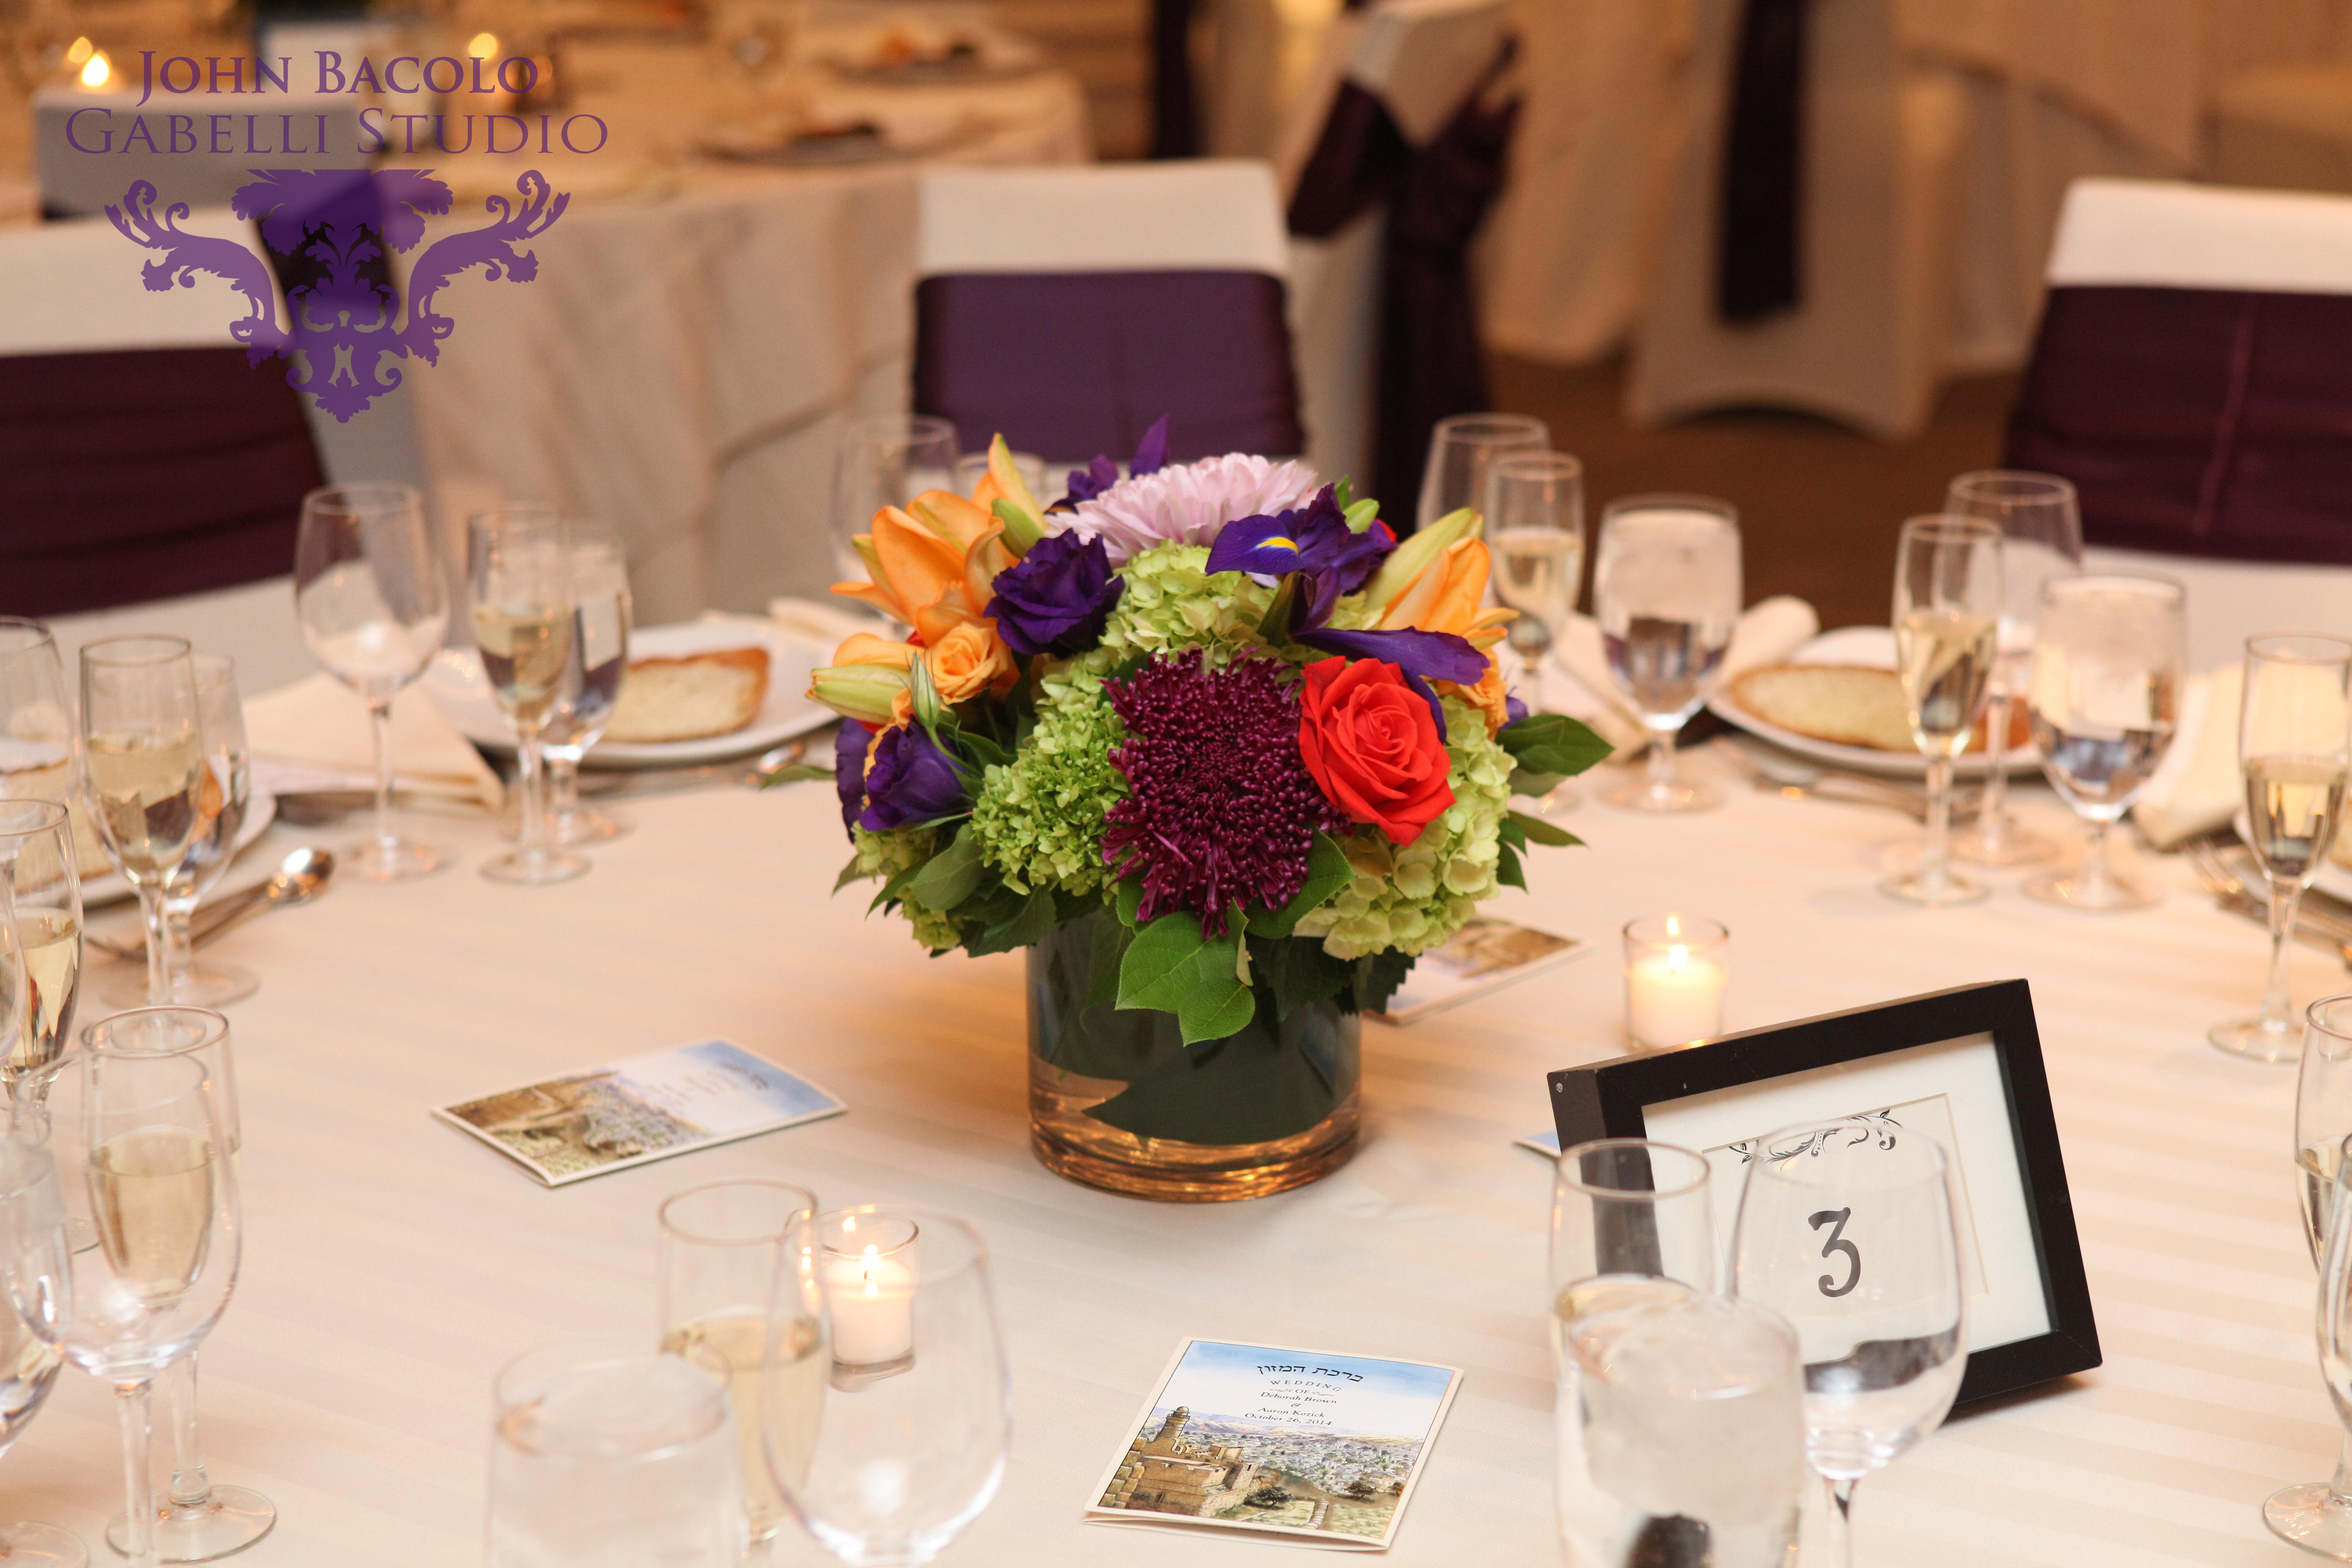 Low - Purple, orange, green vase